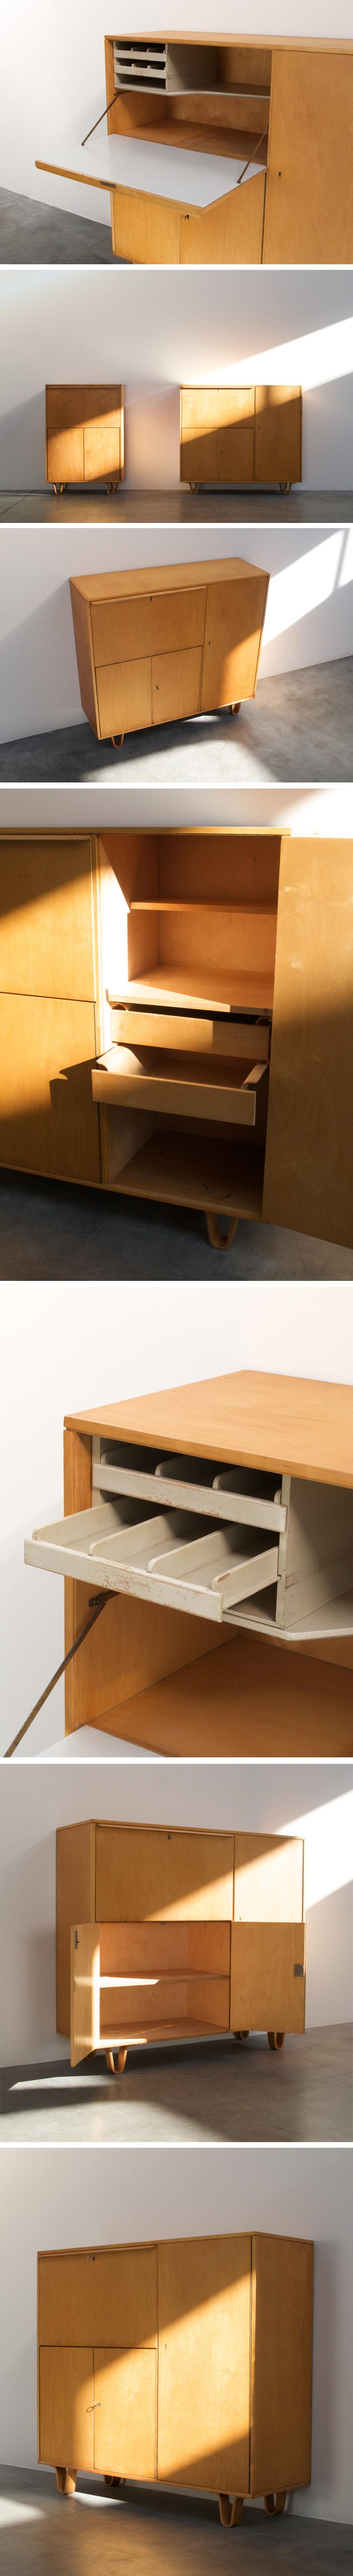 Cees Braakman cabinet CB01 Combex series Large